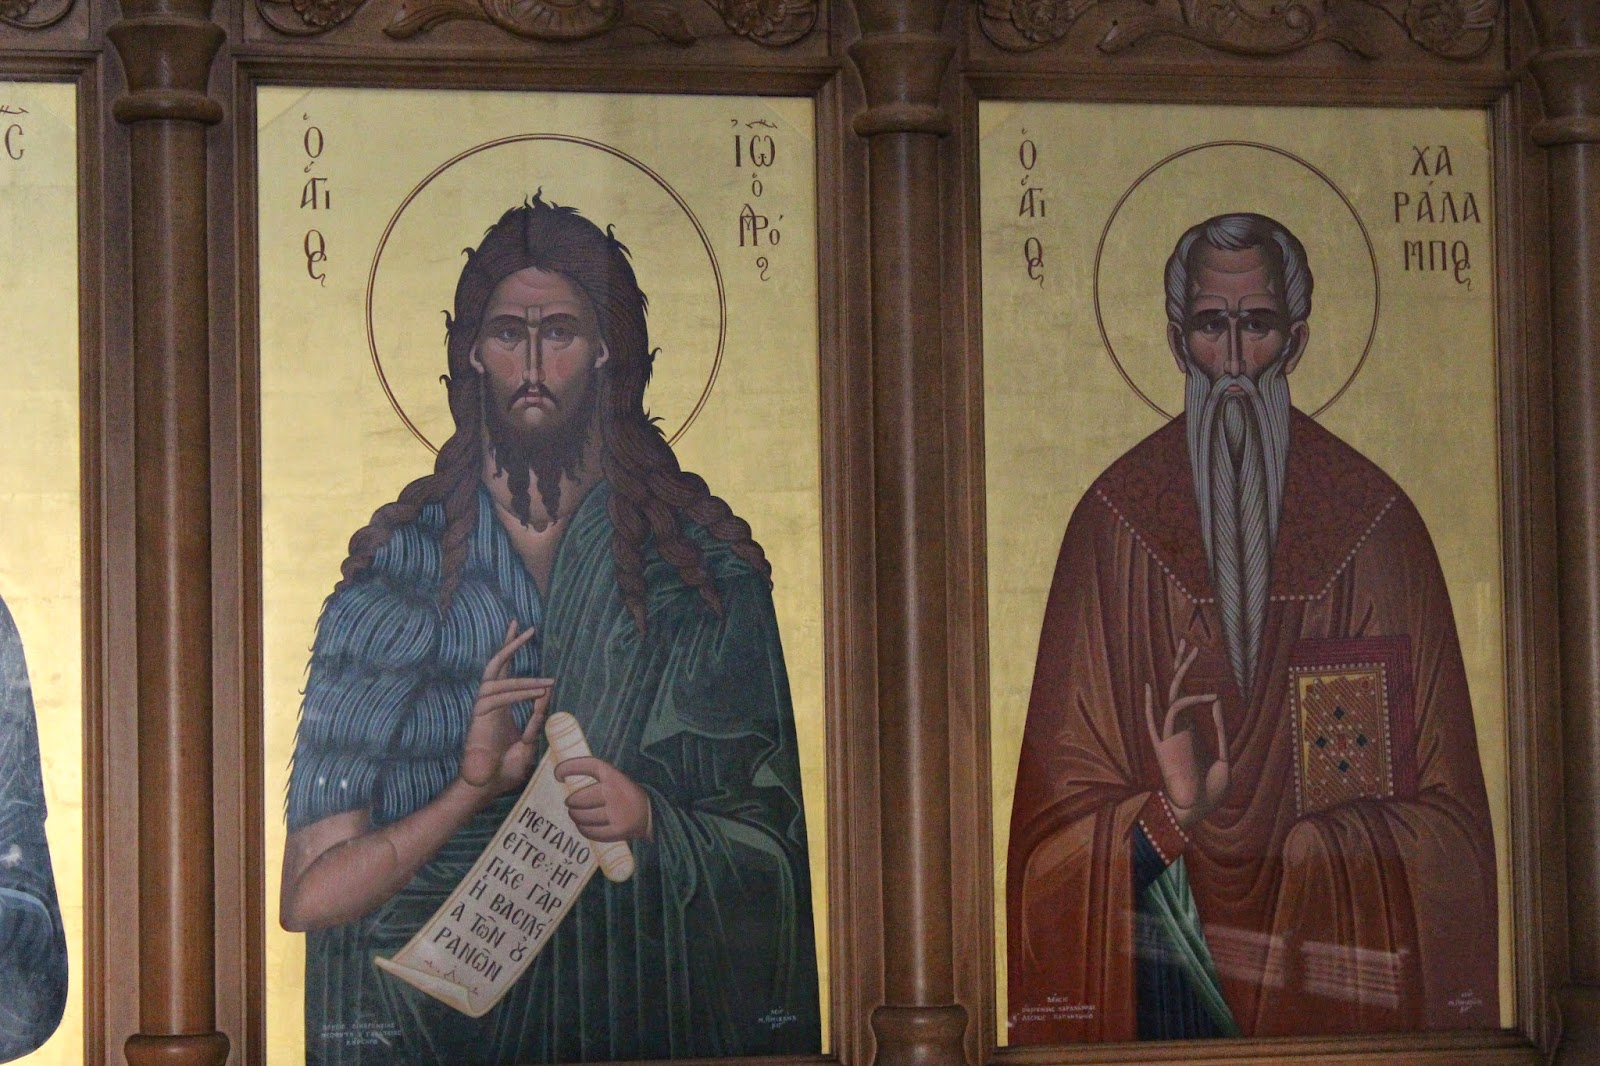 Shaw Voice-4 won priest-monk Photius